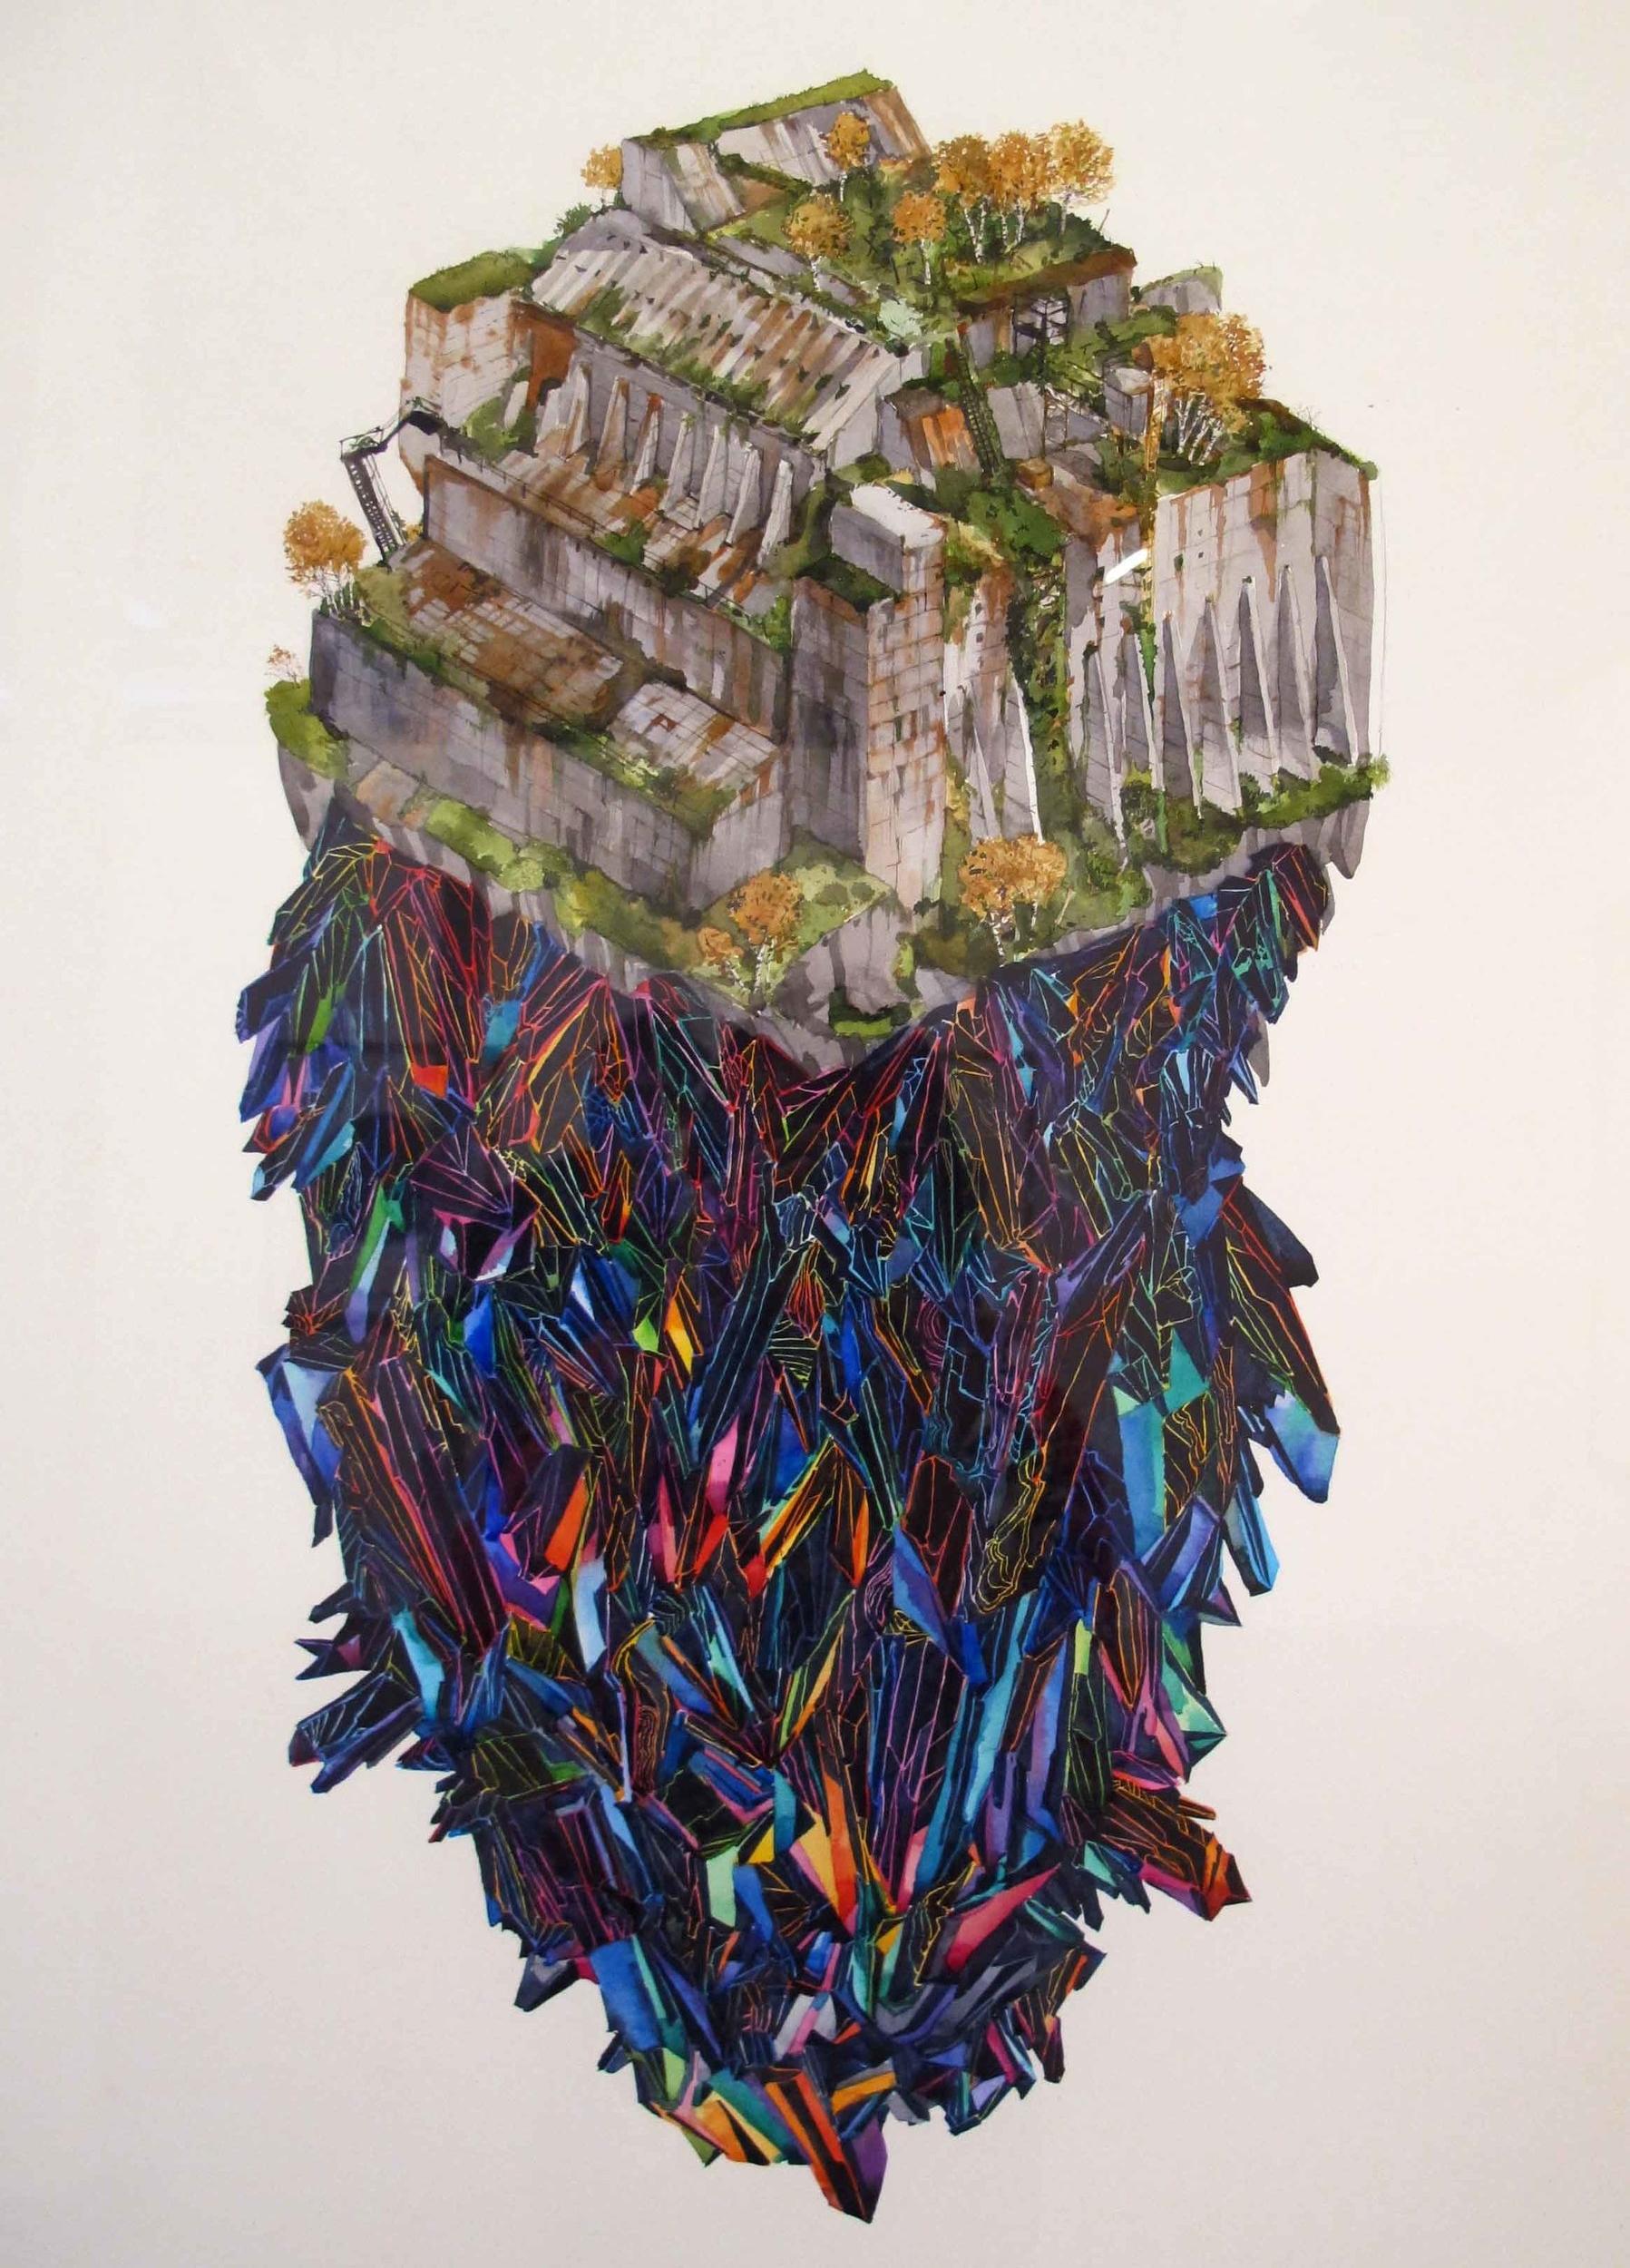 Simon MacEwan, L'Etoile Mysterieuse , 2012, watercolour on paper, 76 x 56cm